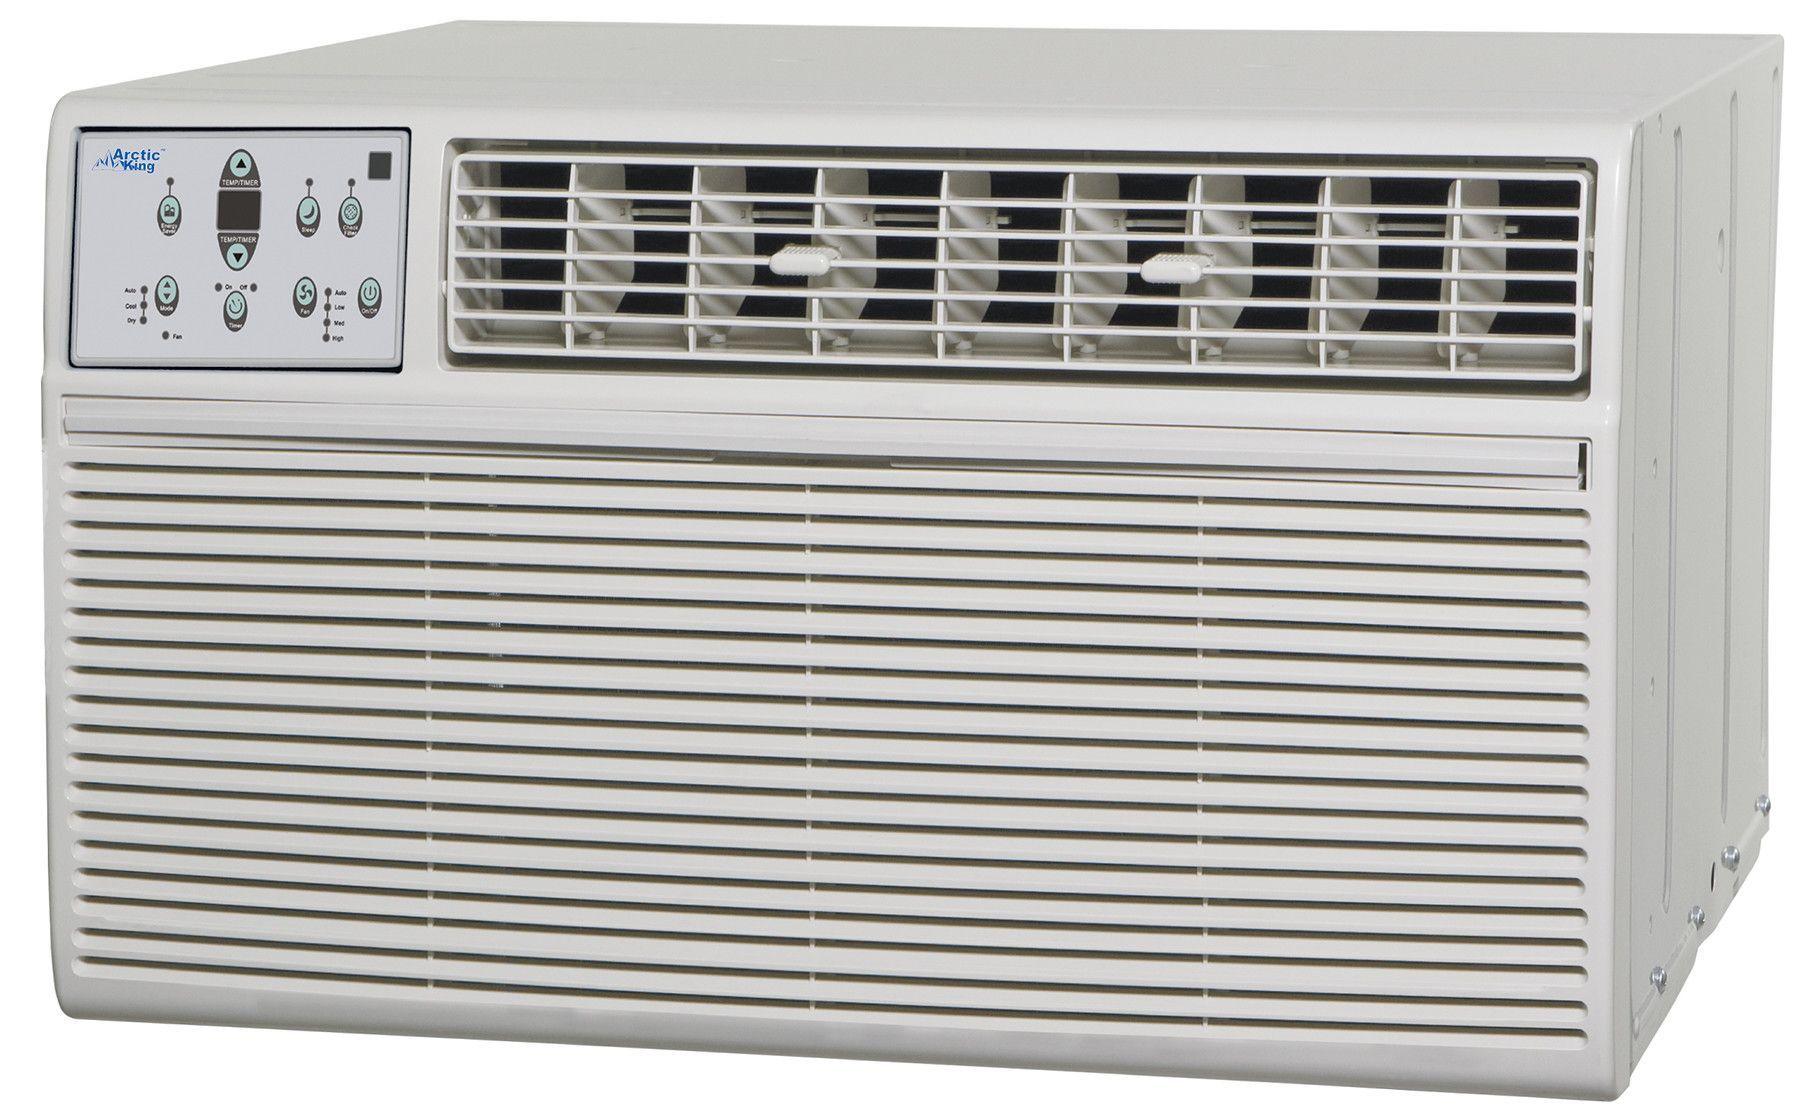 8 000 Btu Window Air Conditioner With Remote Products Window Air Conditioner Amana Air Conditioner Carrier Air Conditioner